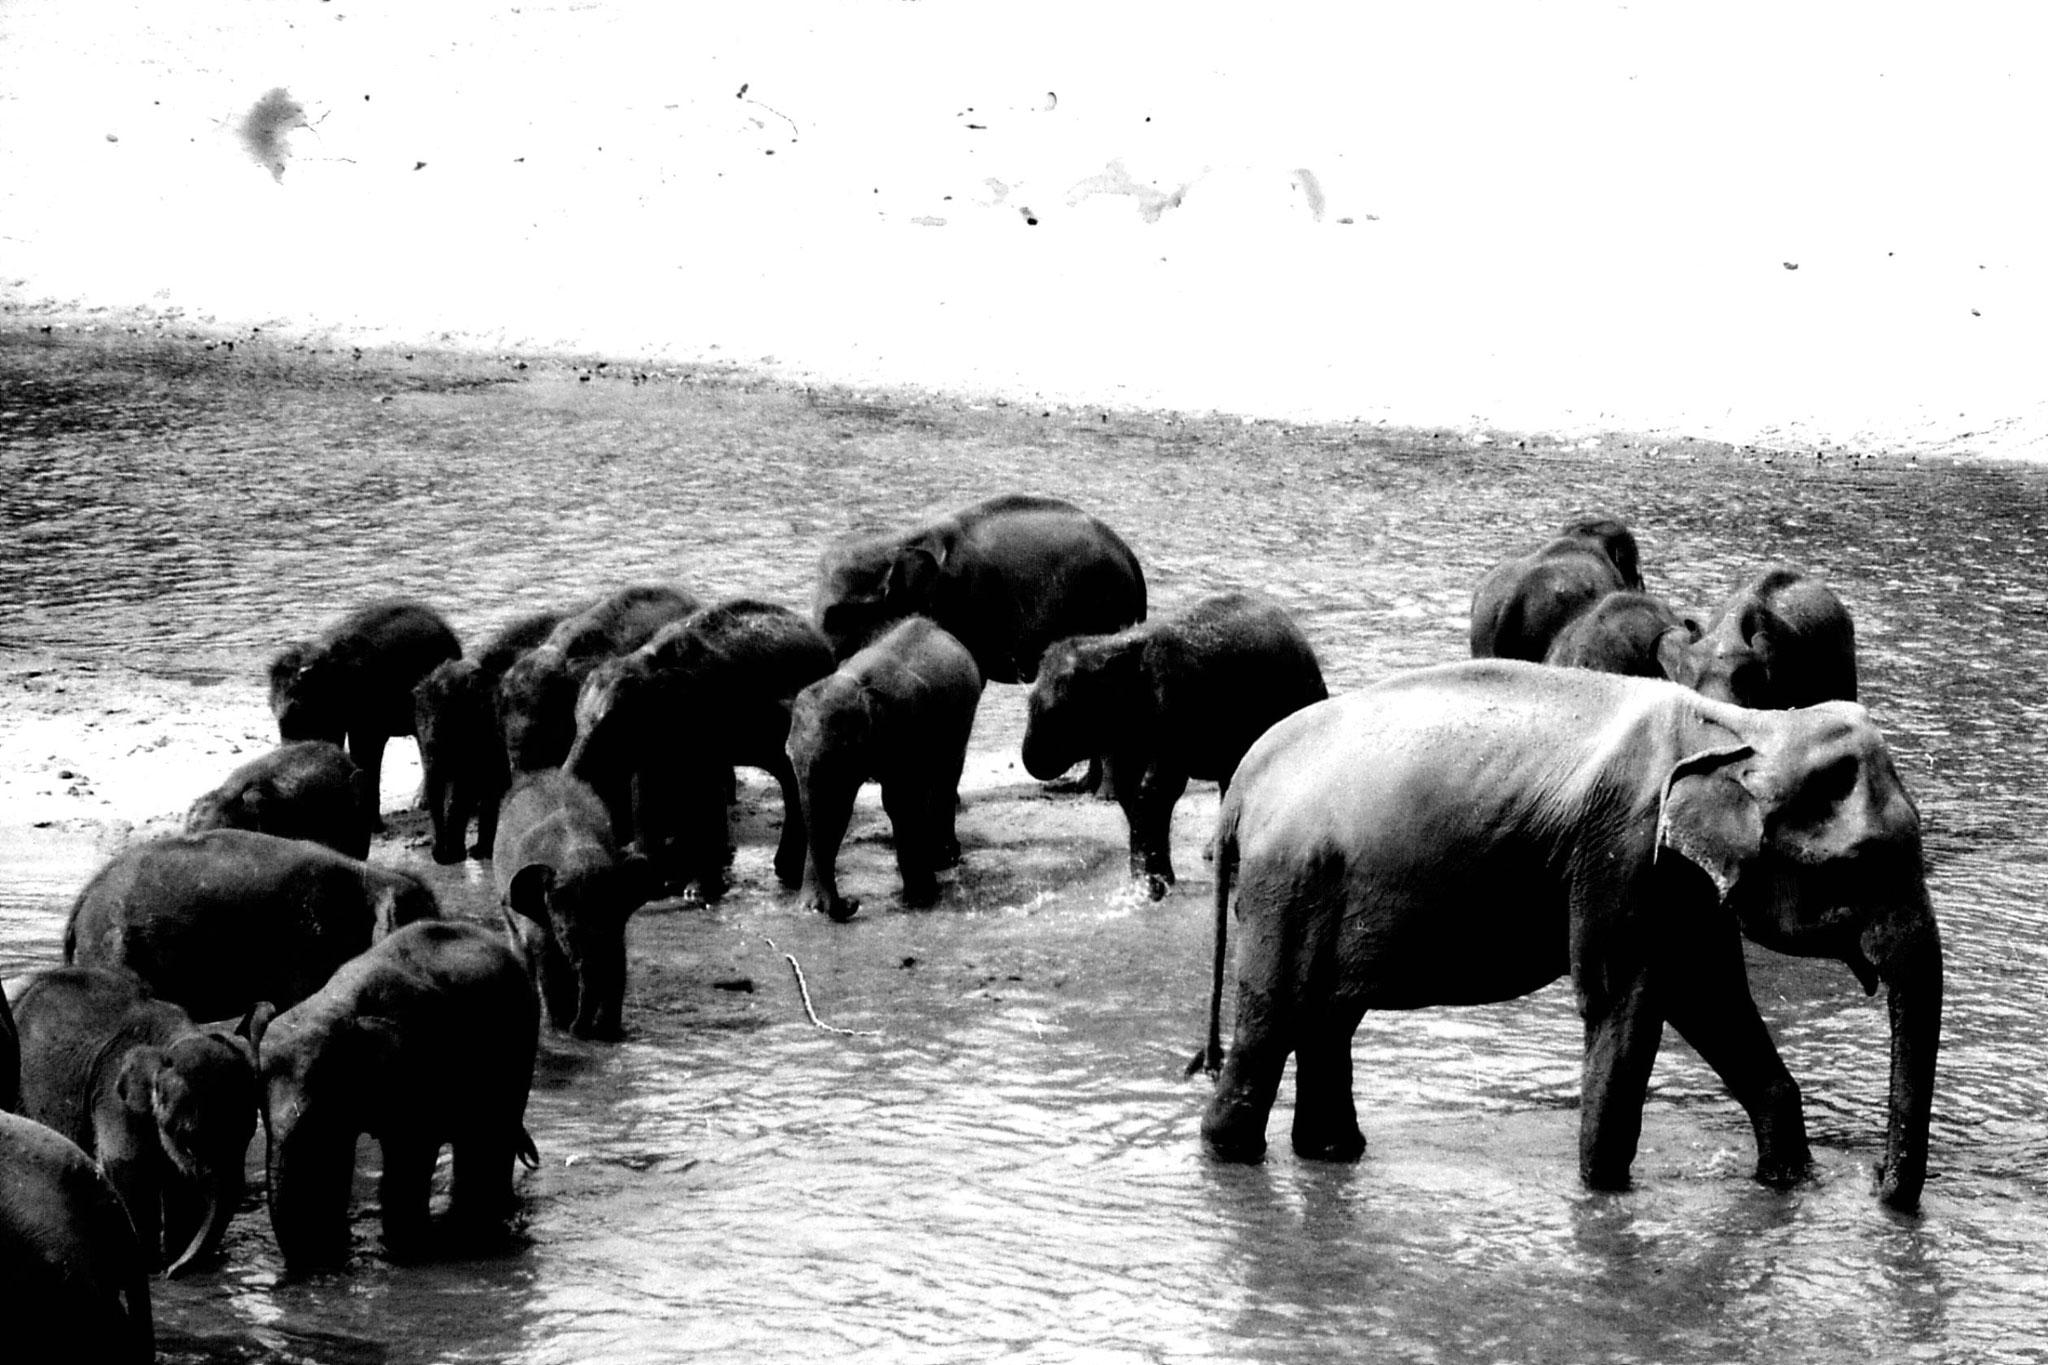 10/2/90: 36: Kegalla elephant orphanage